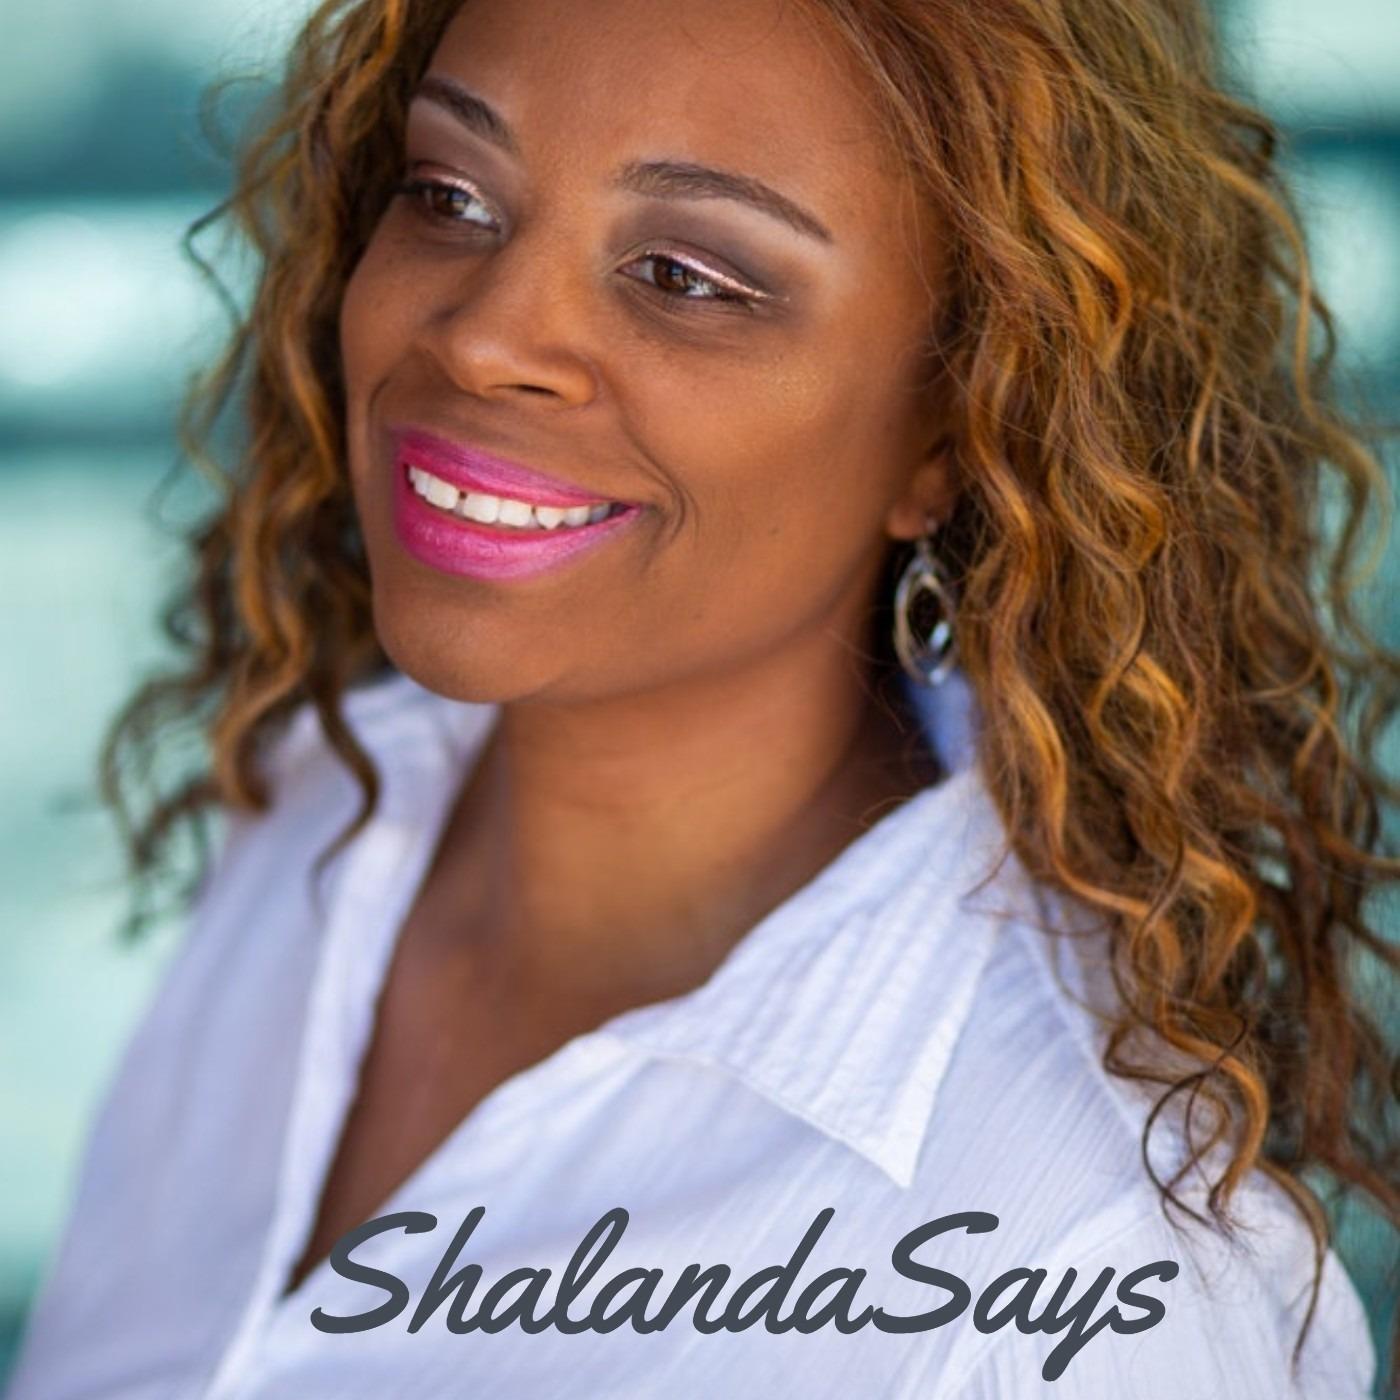 ShalandaSays Meet Career Expert Marc Miller Part 3 of 3